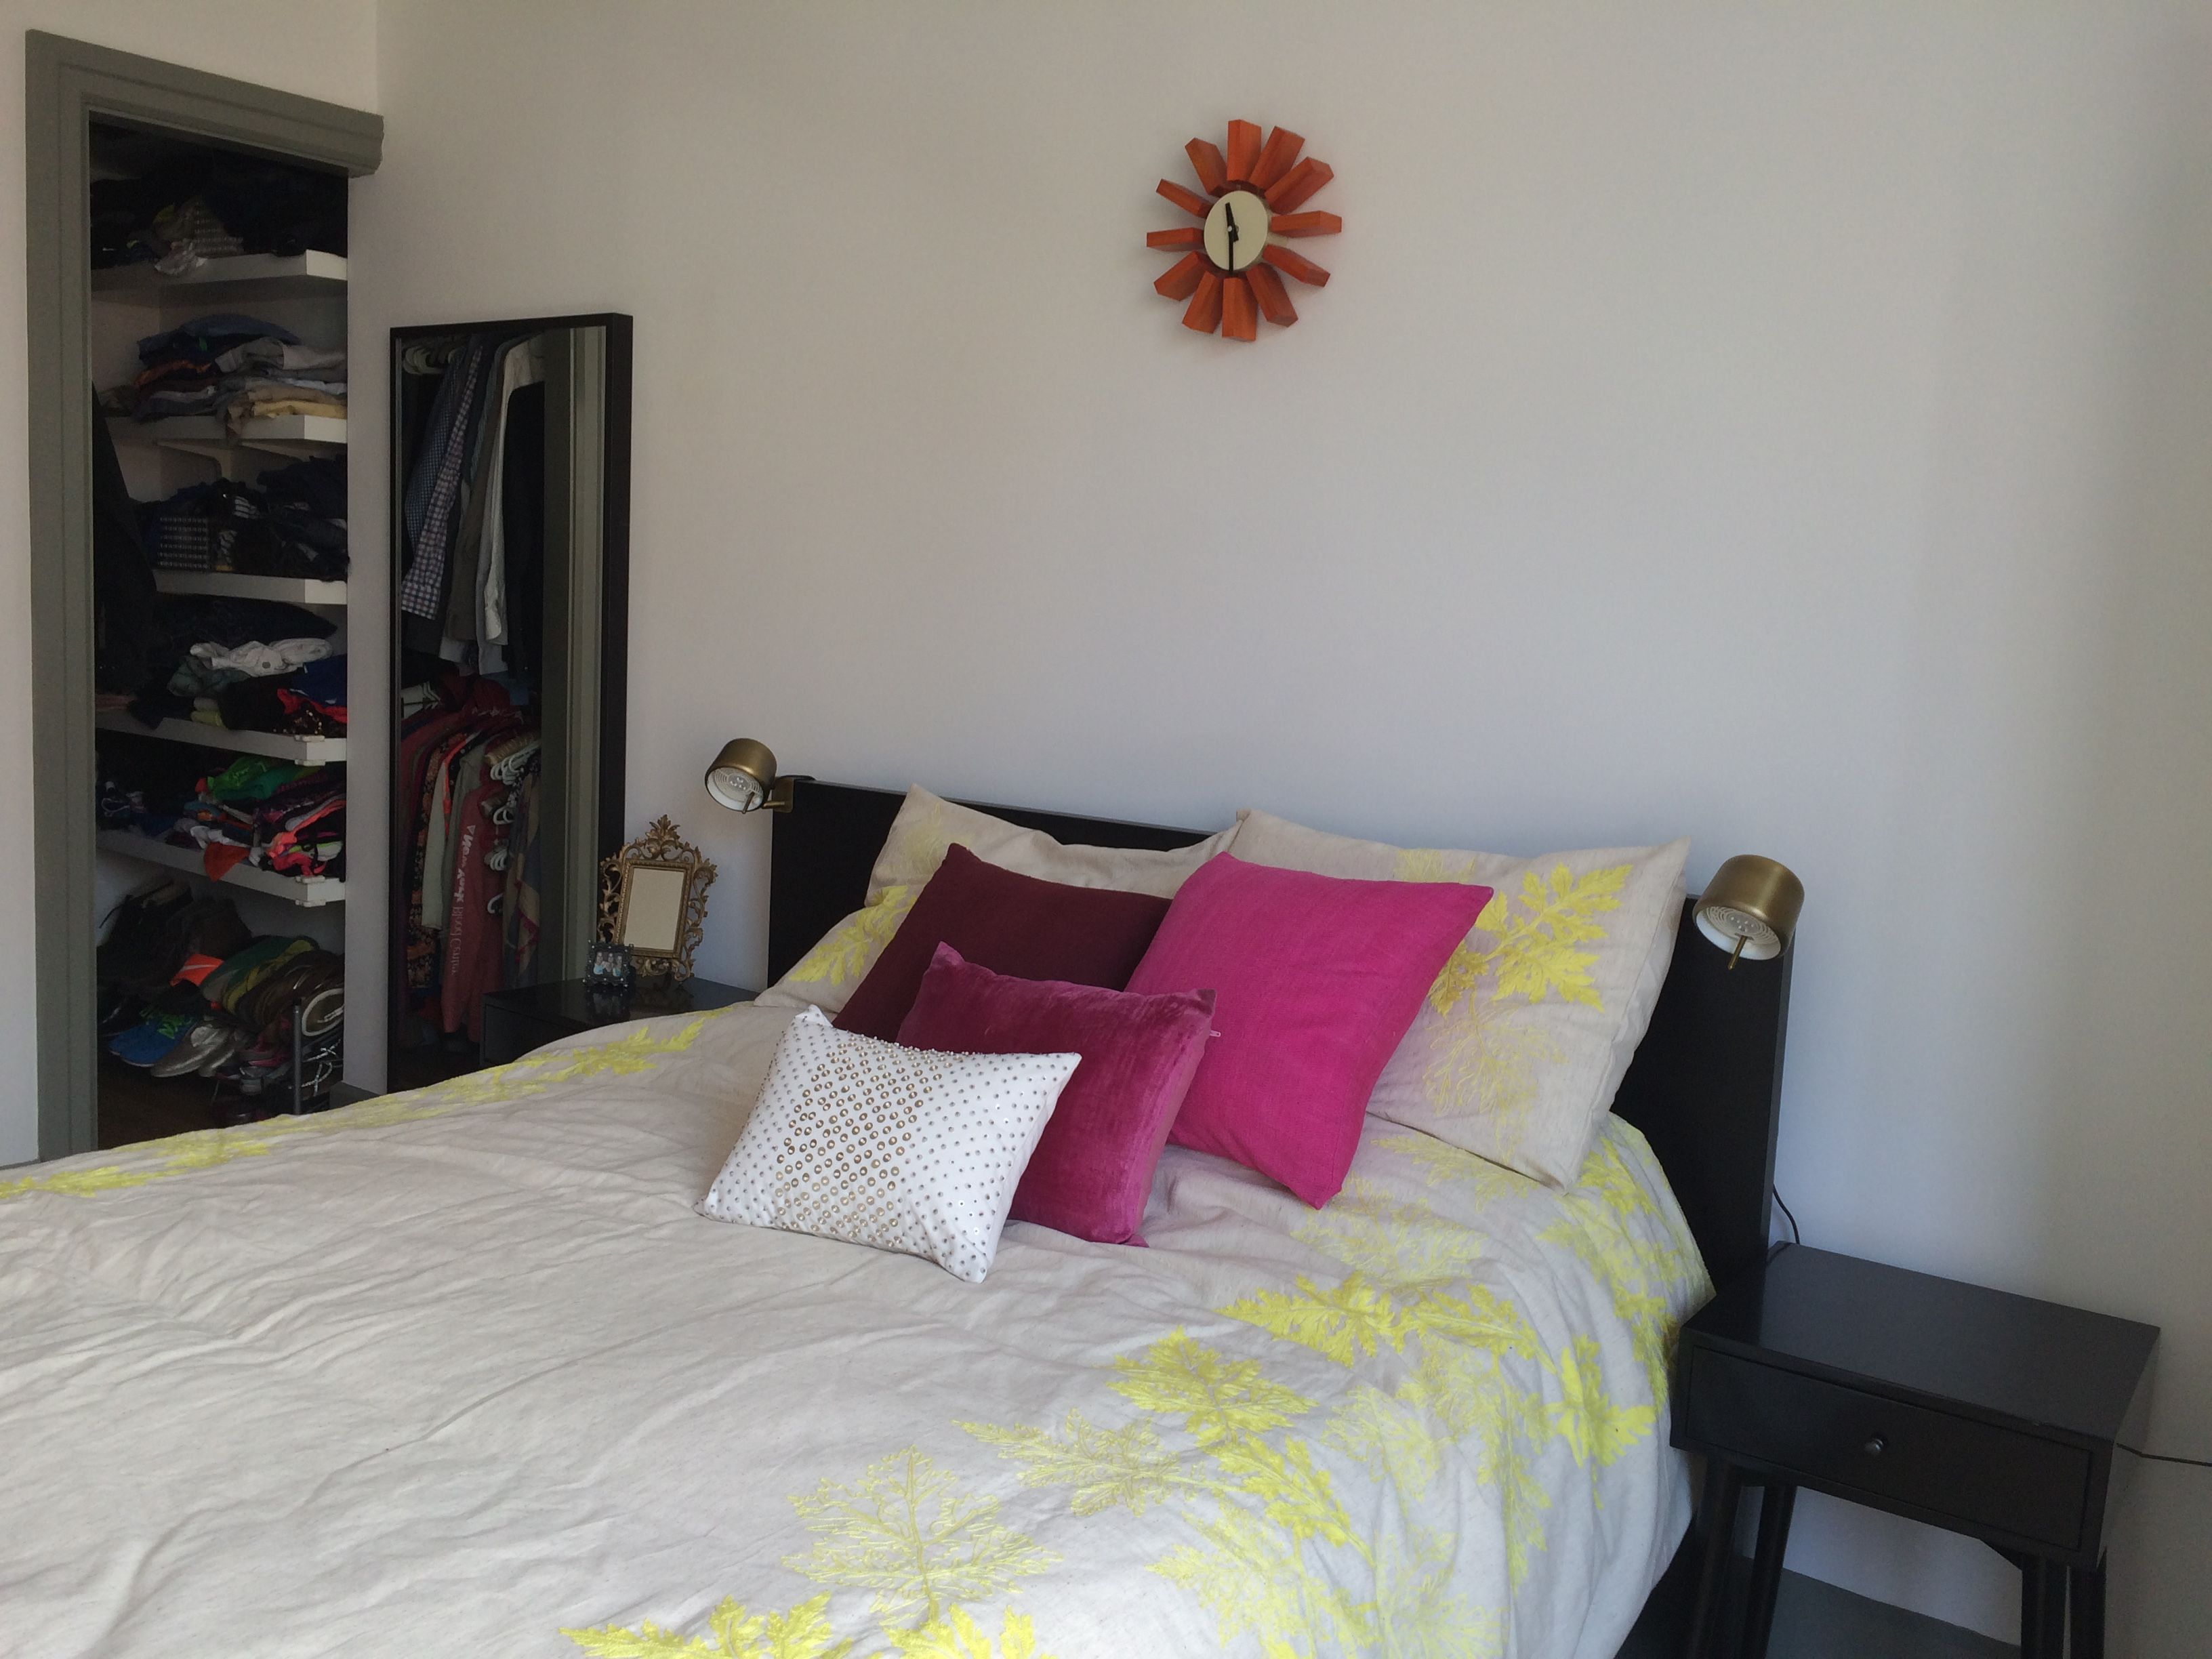 West Elm Embroidered Leaf Border Duvet Cover, ABC Carpet U0026 Home Pillows,  Ikea MALM